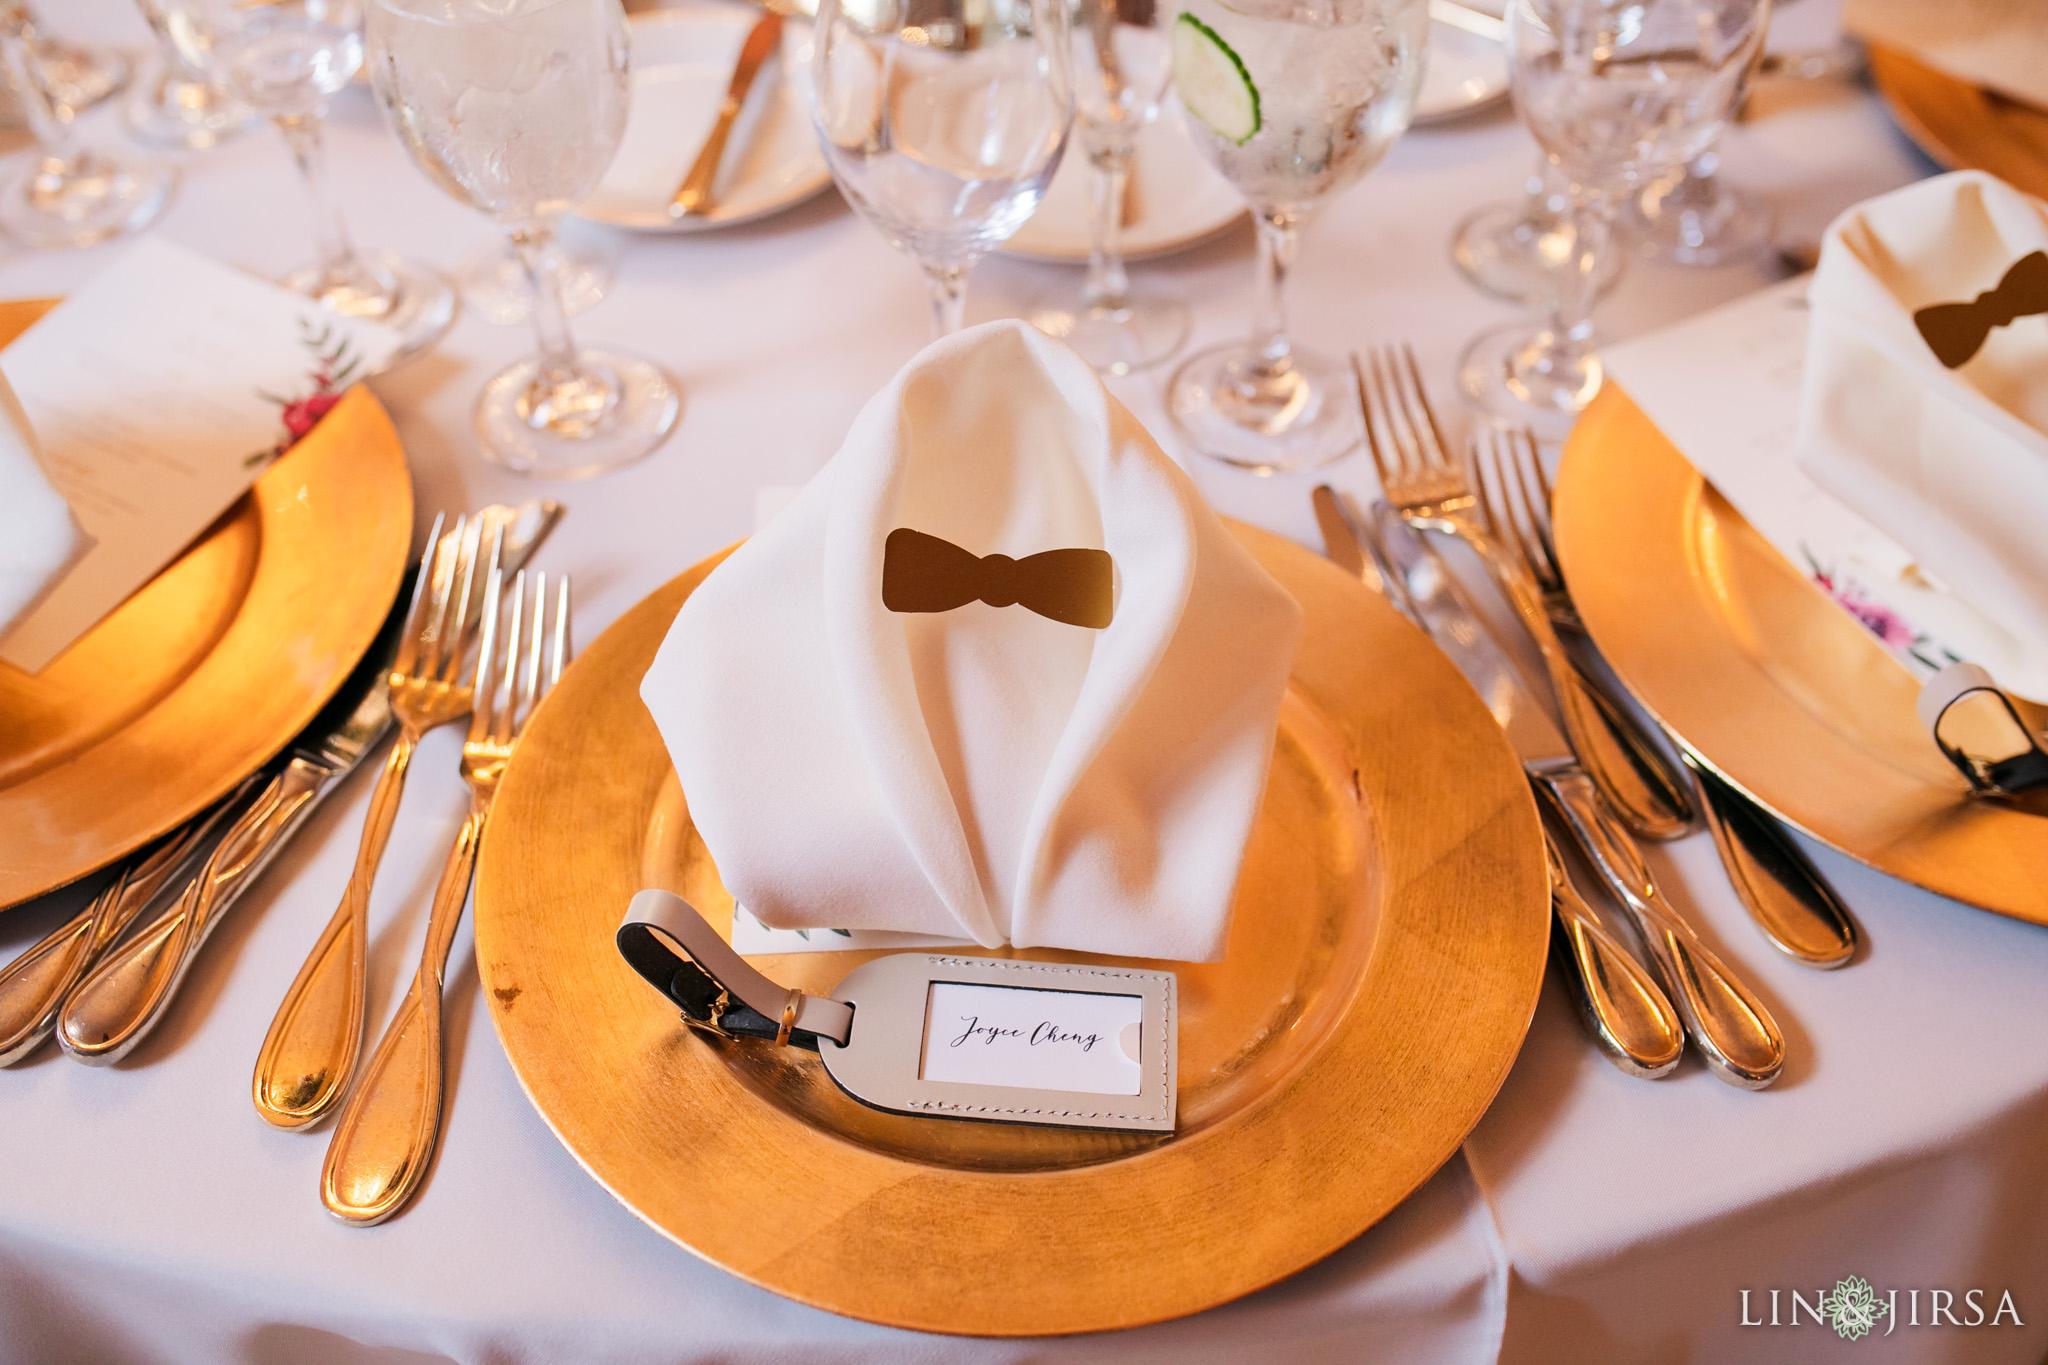 025 richard nixon library wedding reception photography 1